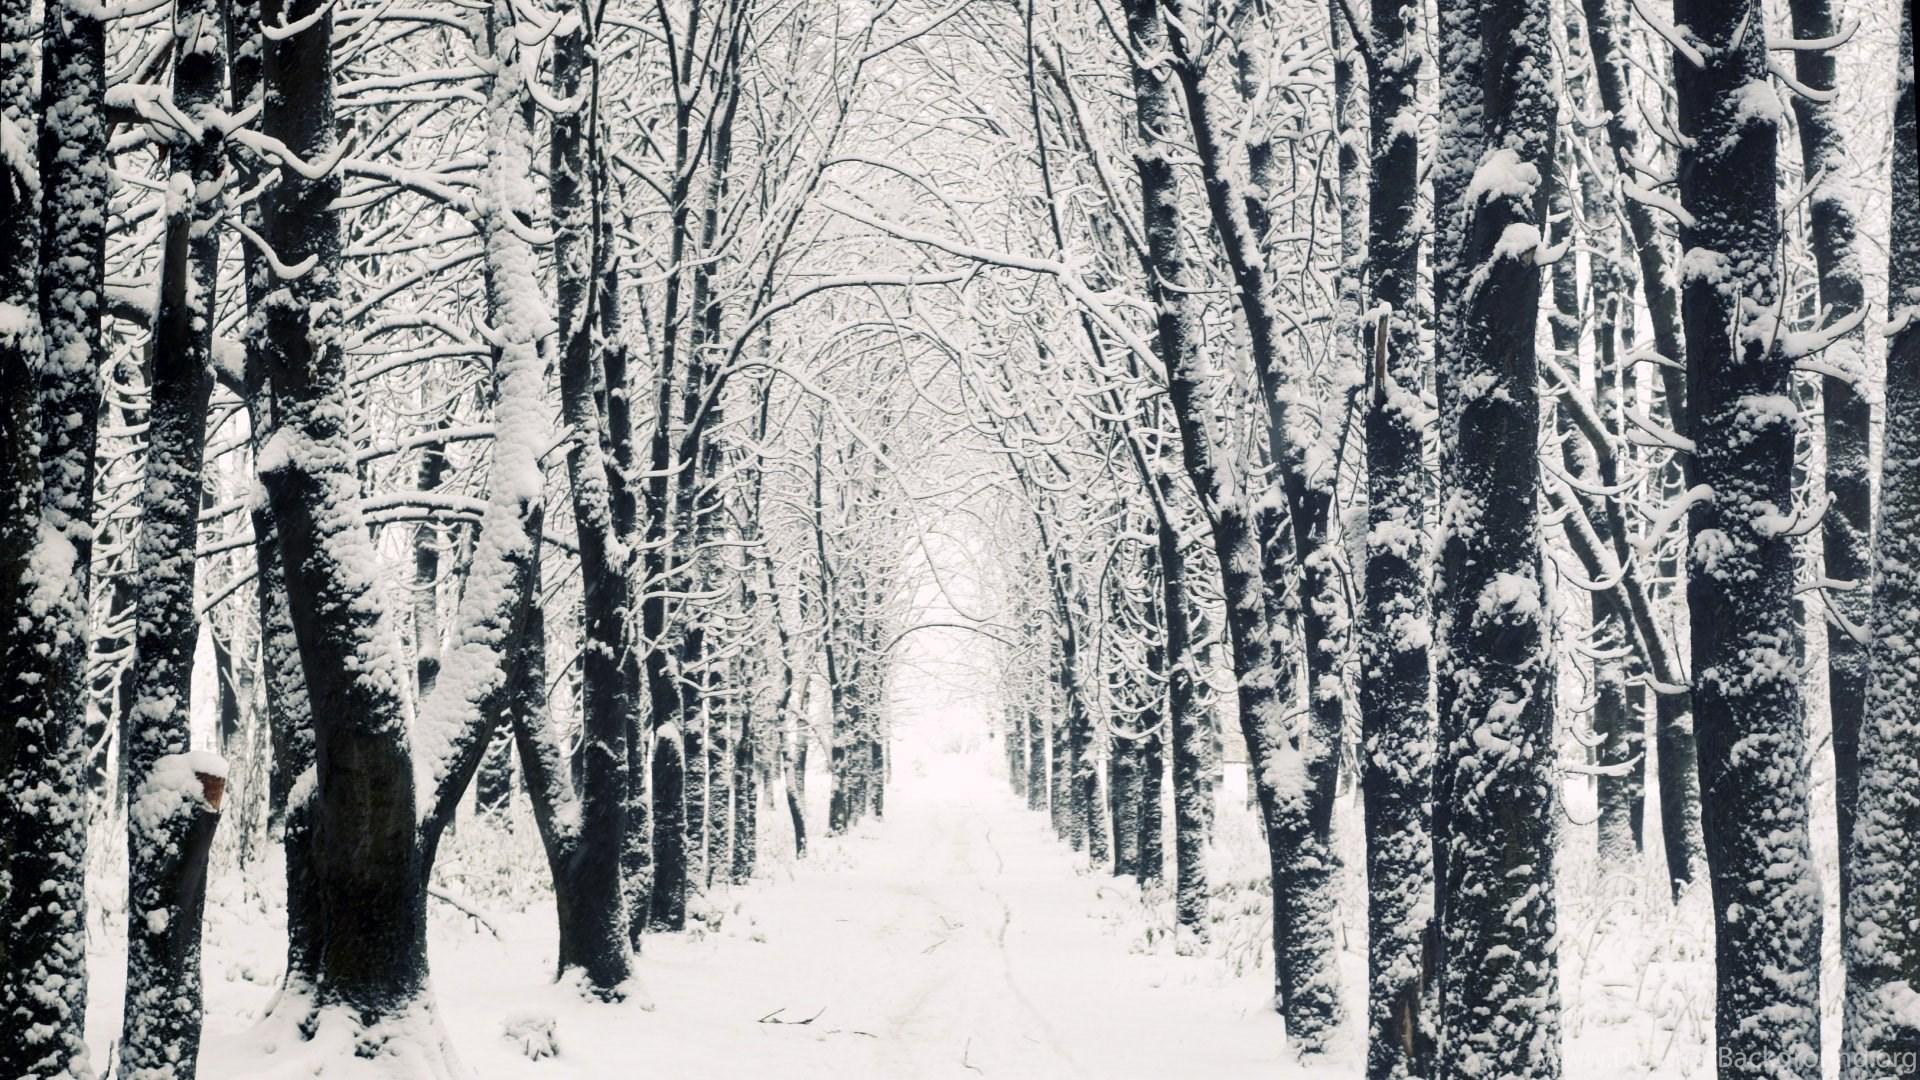 Most Inspiring Wallpaper Mac Winter - 1051588_snowy-apple-mac-hd-wallpapers-winter-forest_1920x1080_h  Pic_92364.jpg